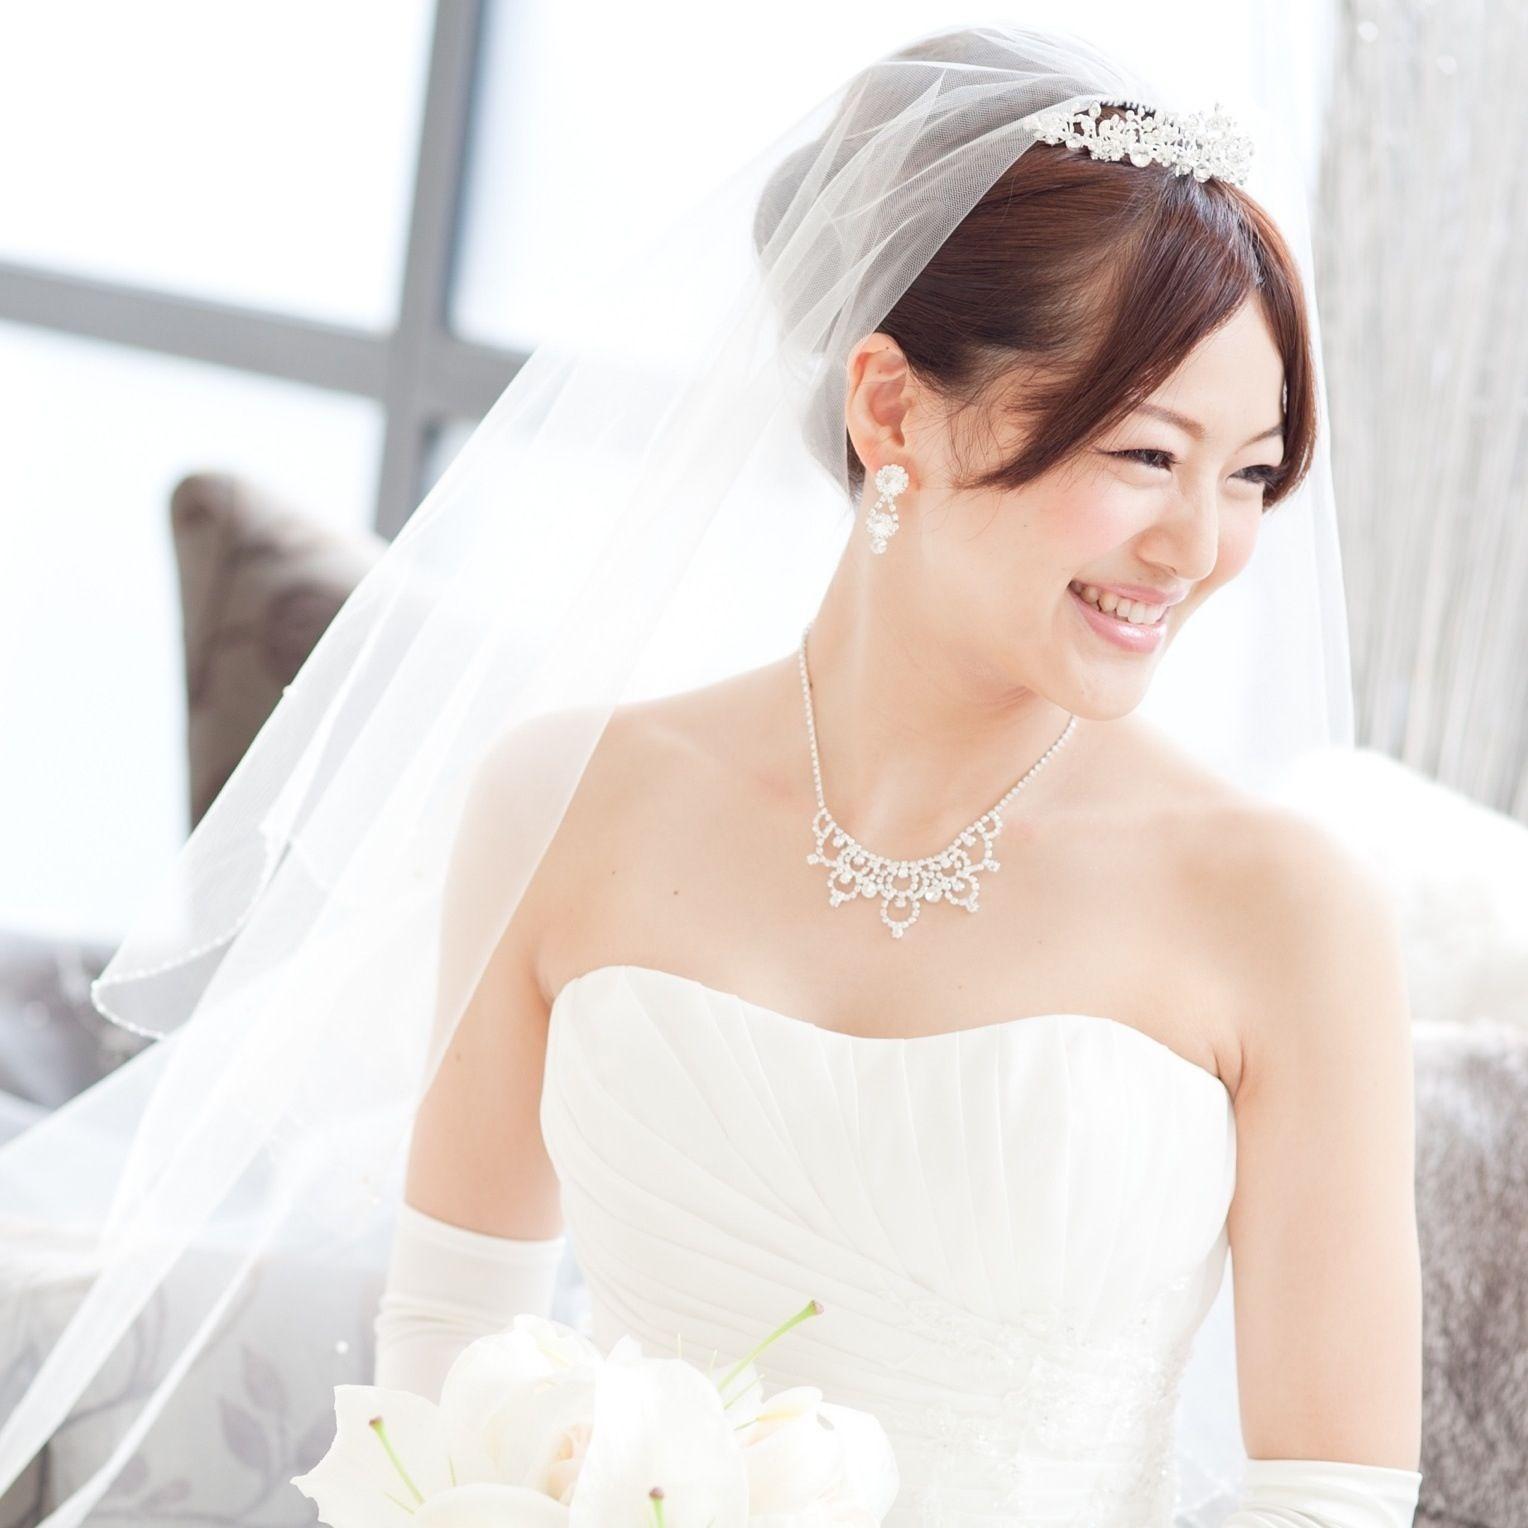 Wedding White Teeth: Pinterest